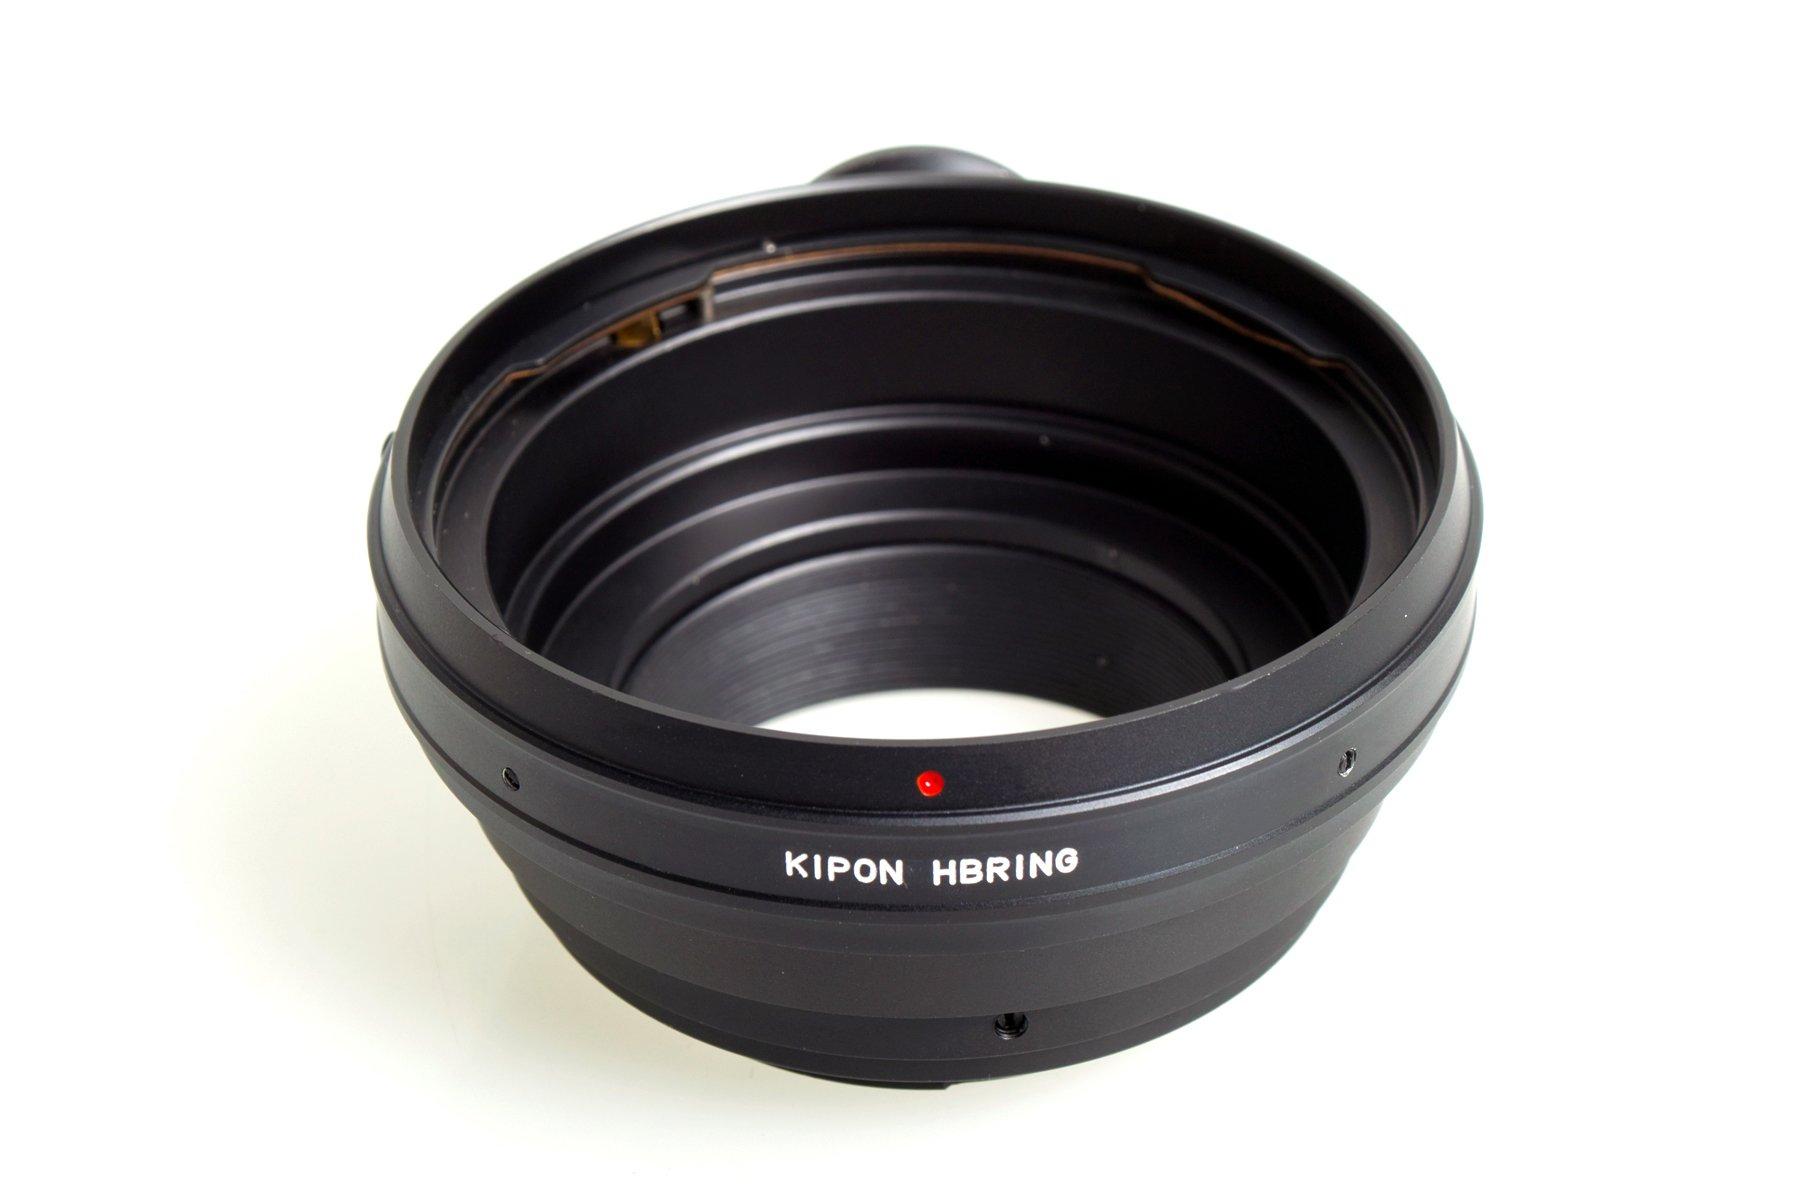 KIPON adaptér objektivu Hasselblad V na tělo Canon EOS